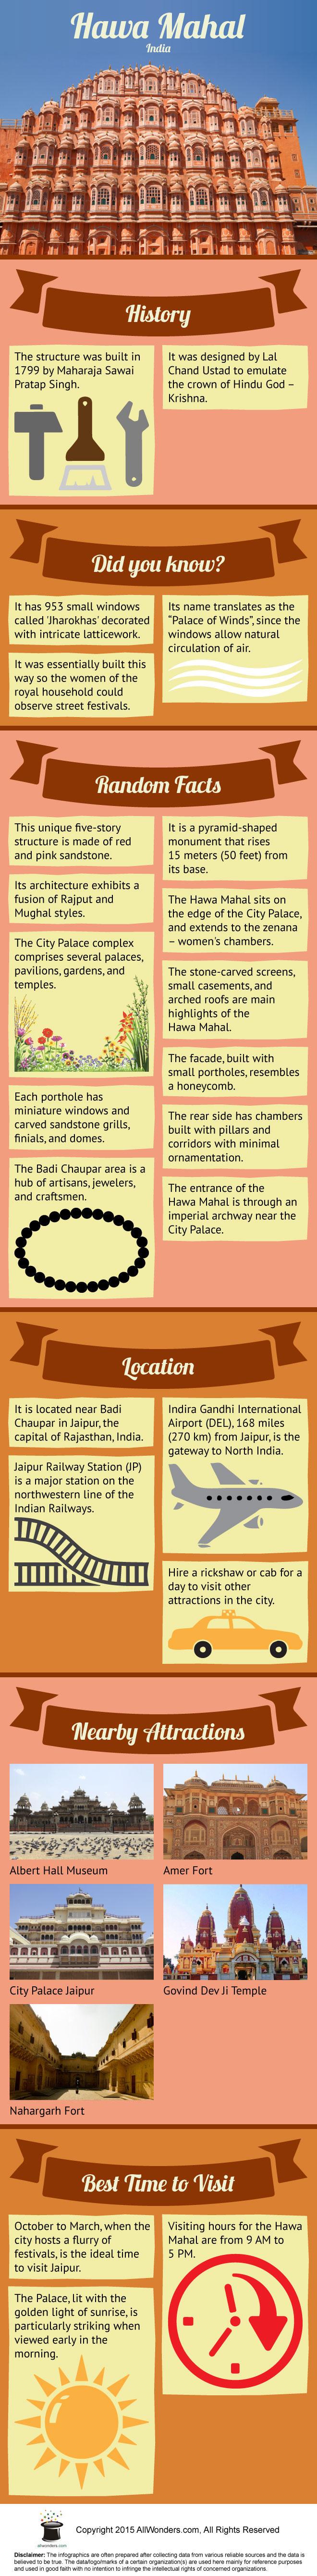 Hawa Mahal Infographic